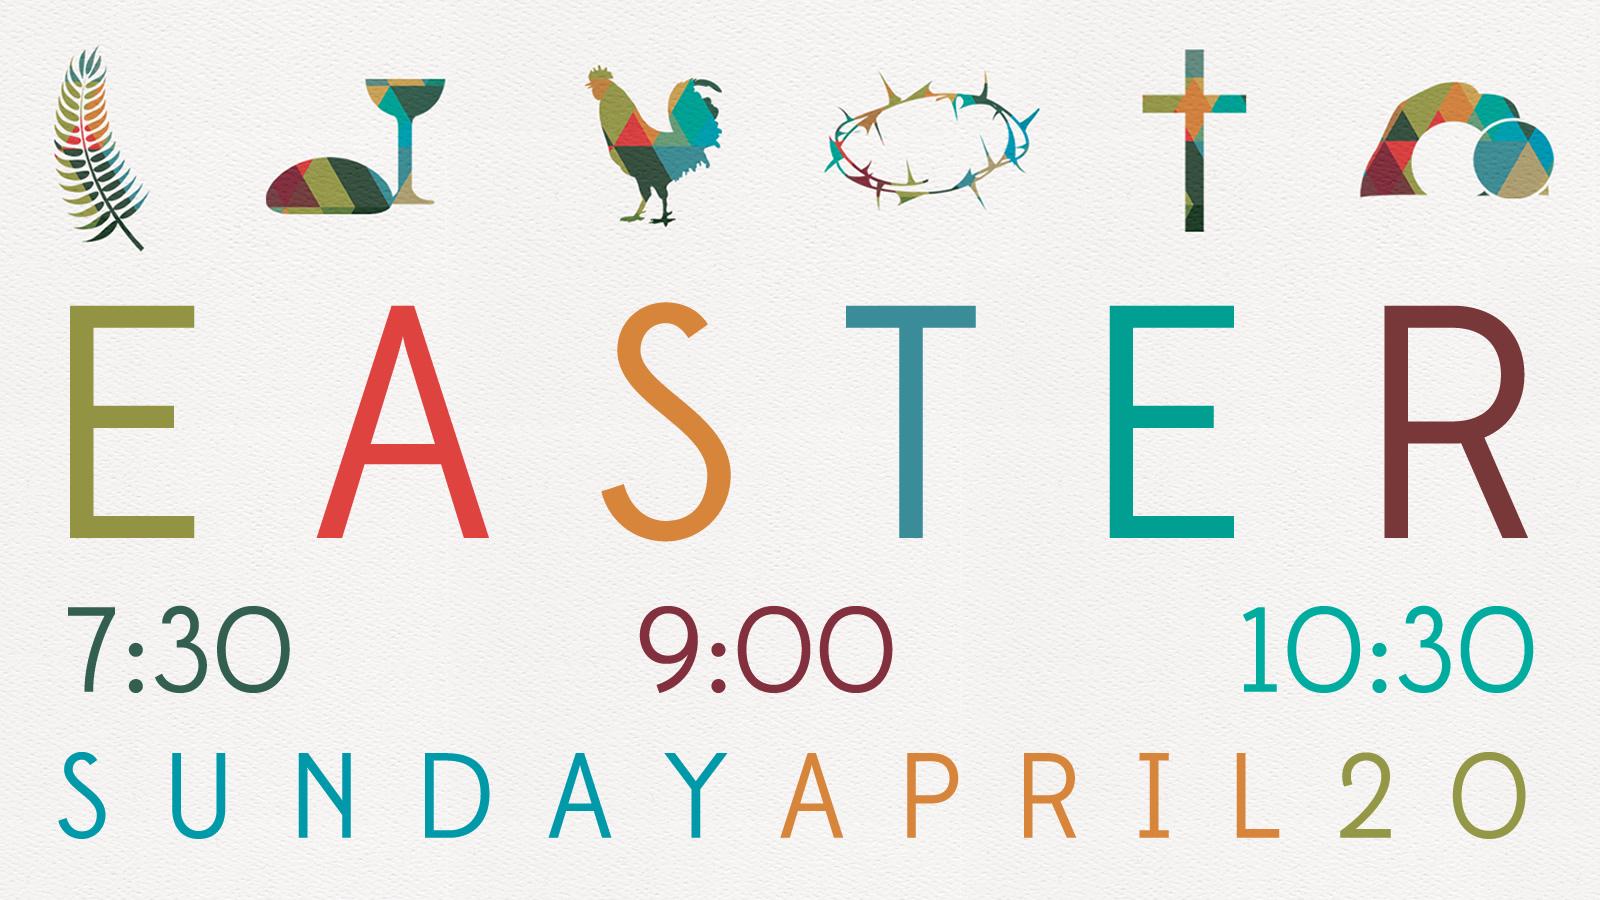 easter sunday 2015 dates catholic orthodox click for details easter ...